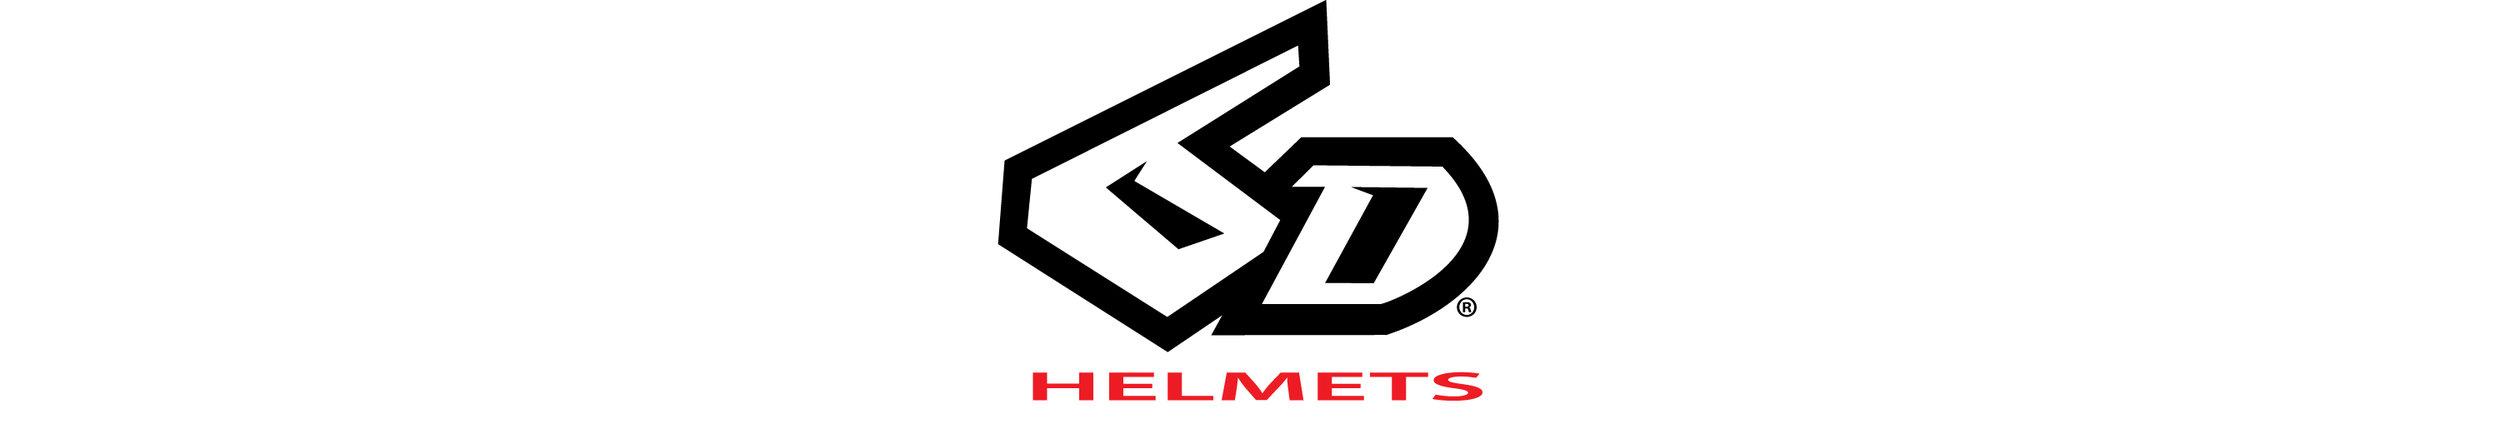 6D Logo.jpg